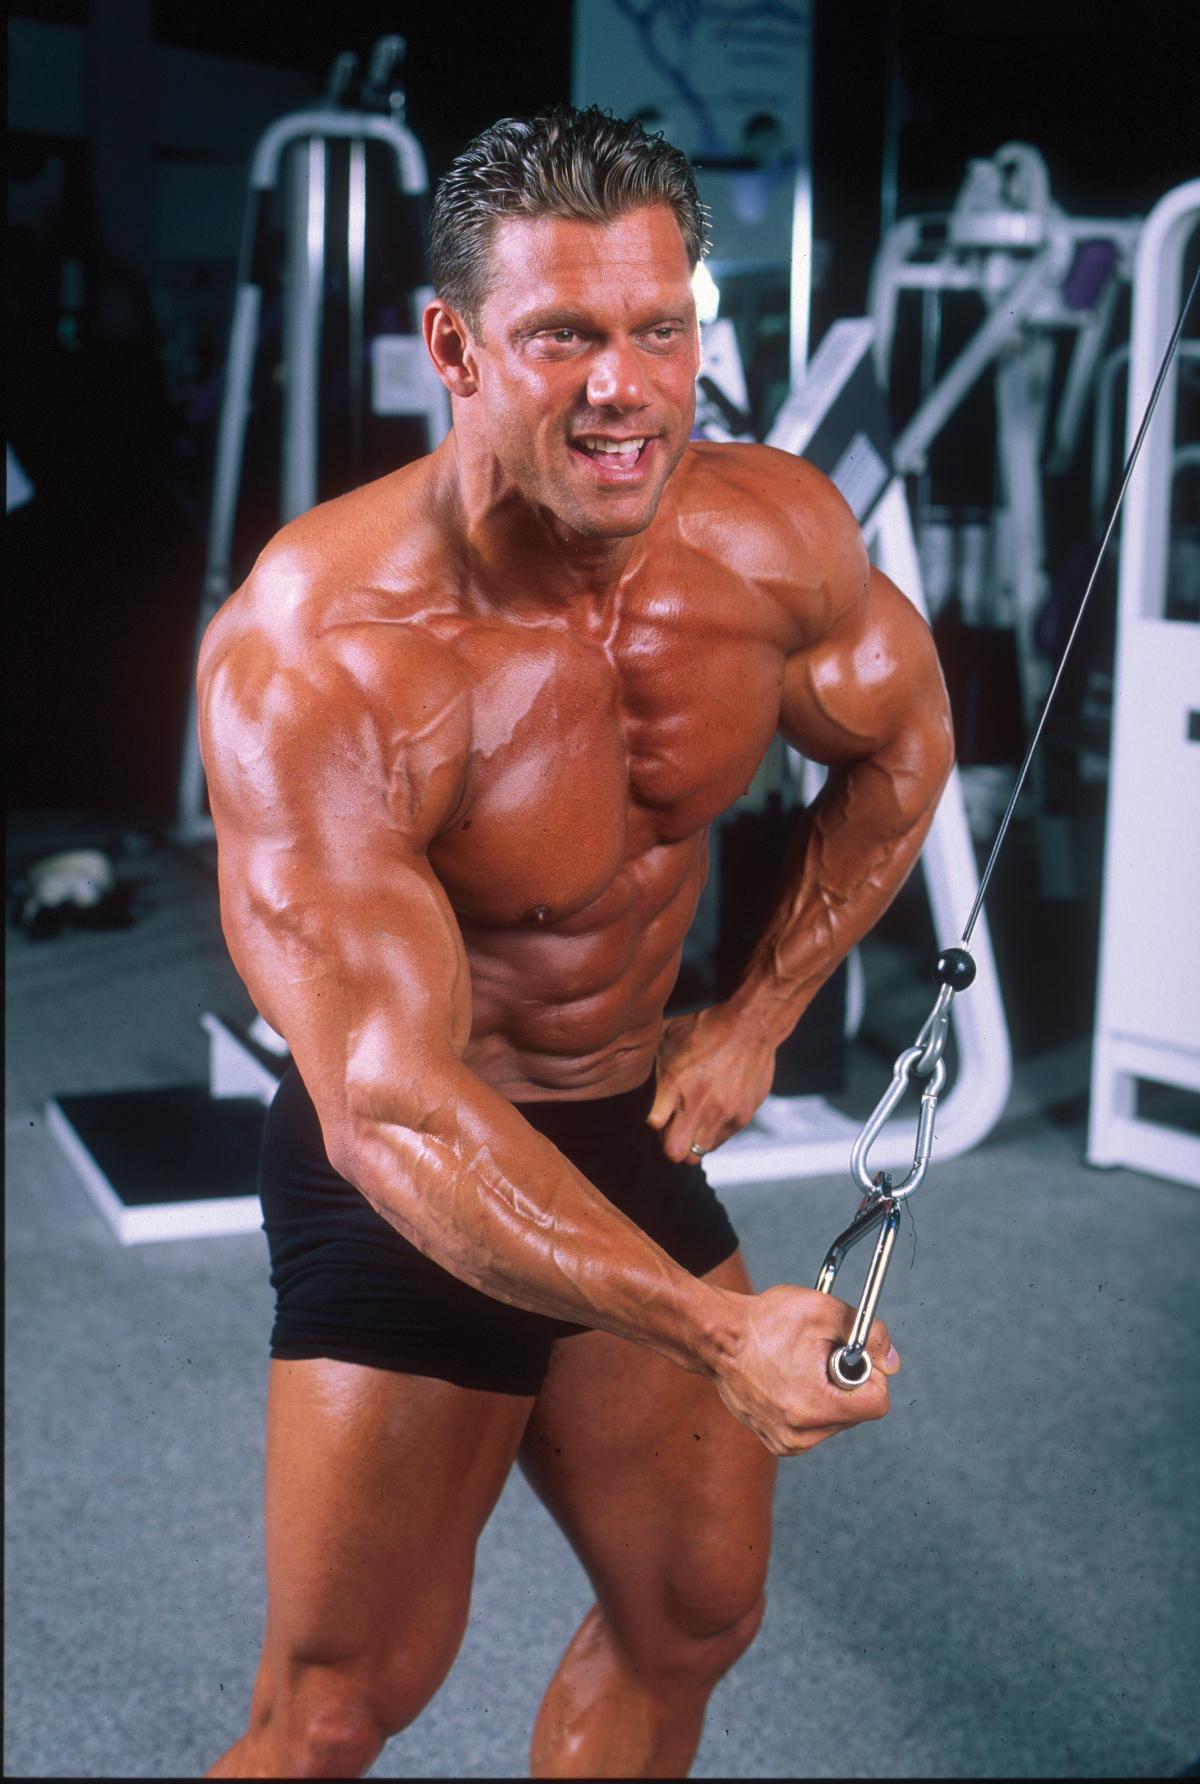 parrillo-principles-guy-exercising